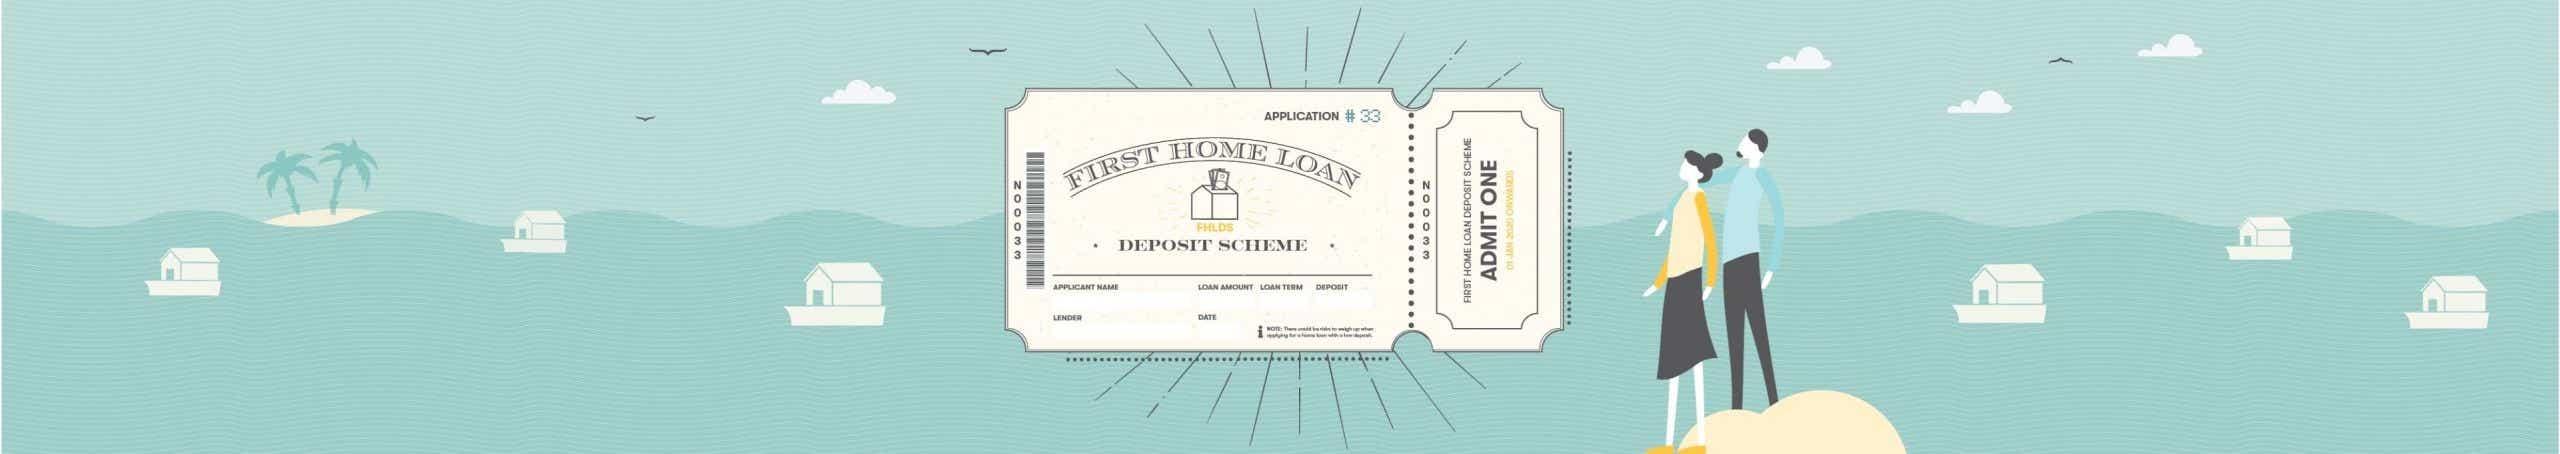 First Home Loan Deposit Scheme Application Illustration Banner